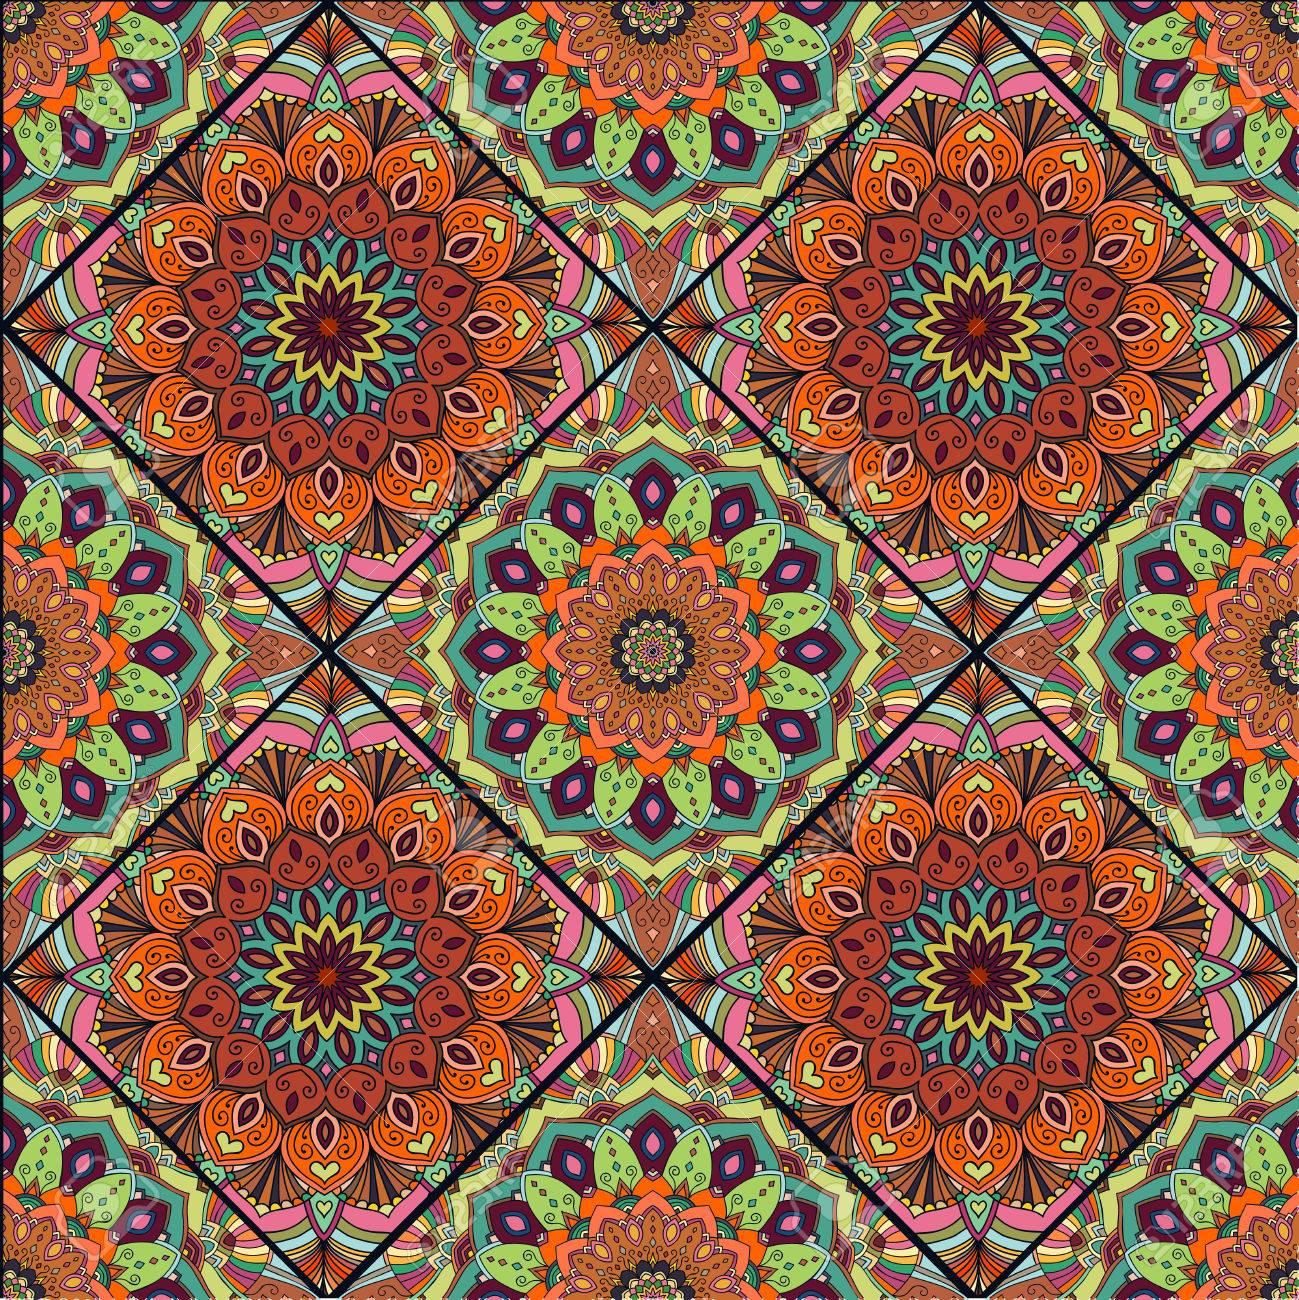 Nieuw Blue Boho Bloem Naadloze Patroon. Mandala Patchwork, Bloemen PF-91